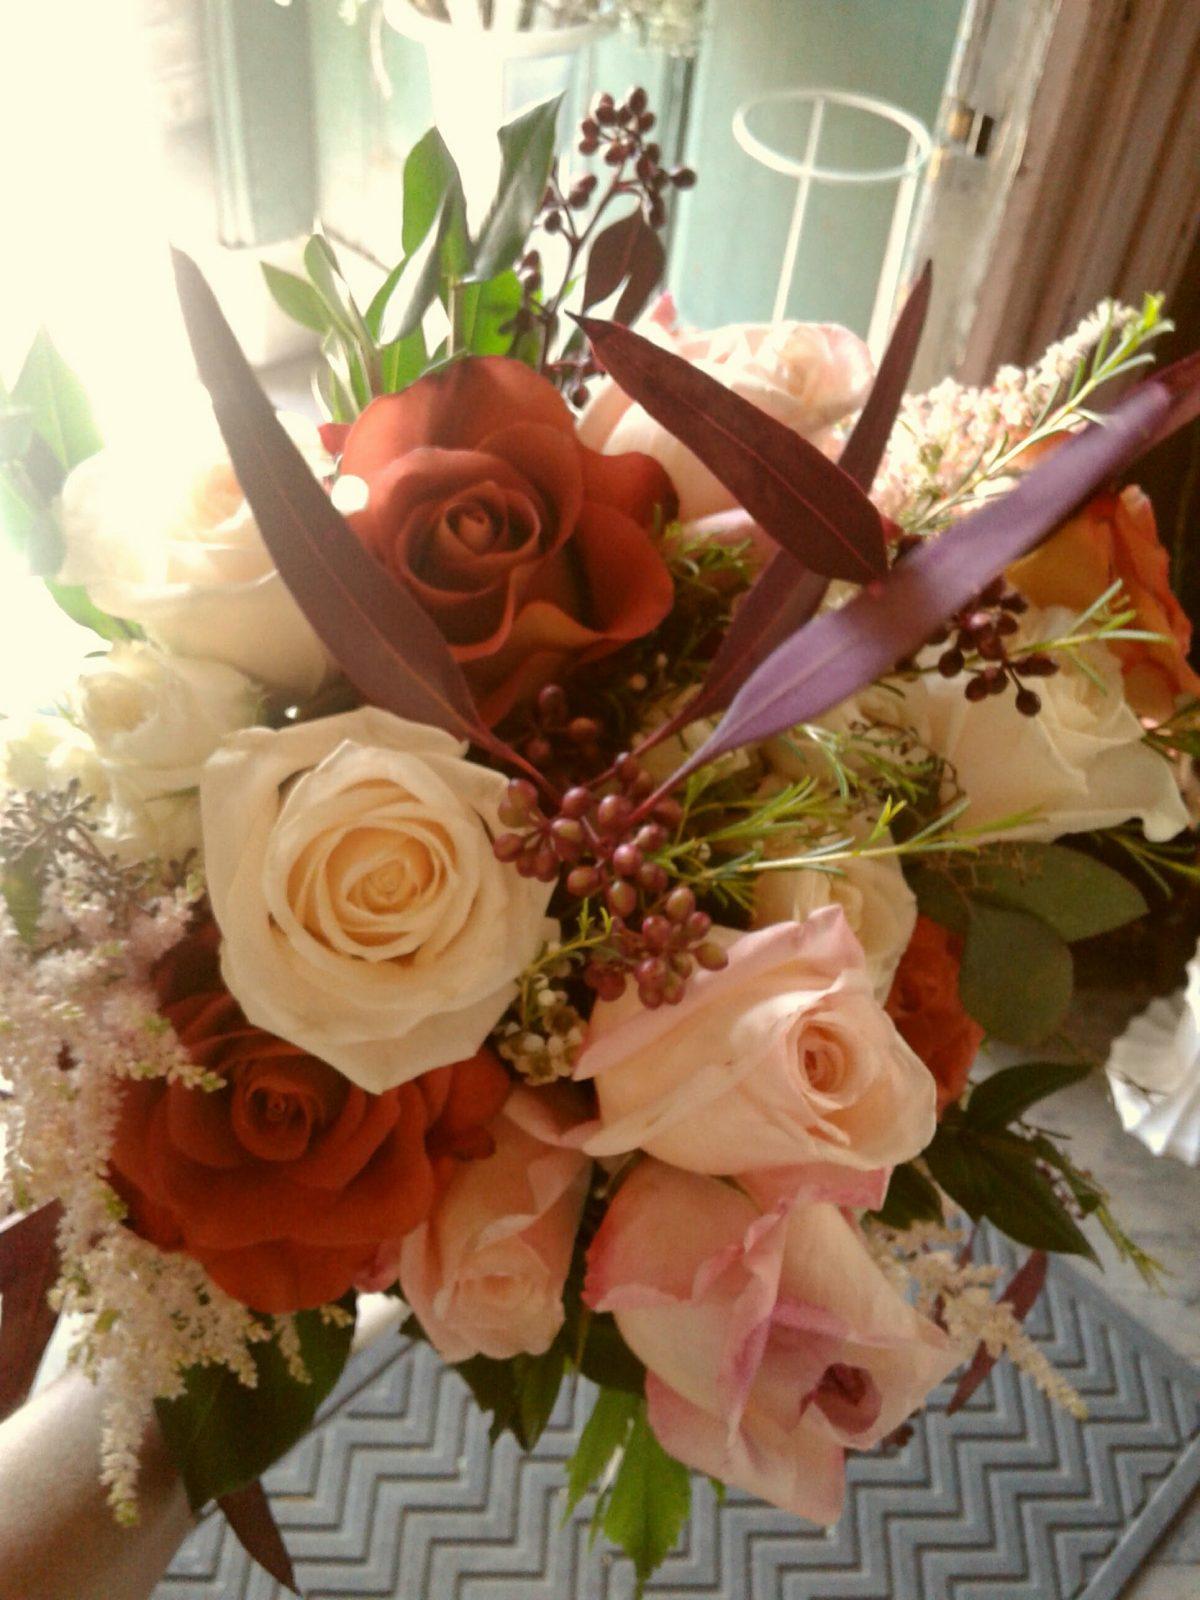 2019 wedding flowers - weddings on a budget